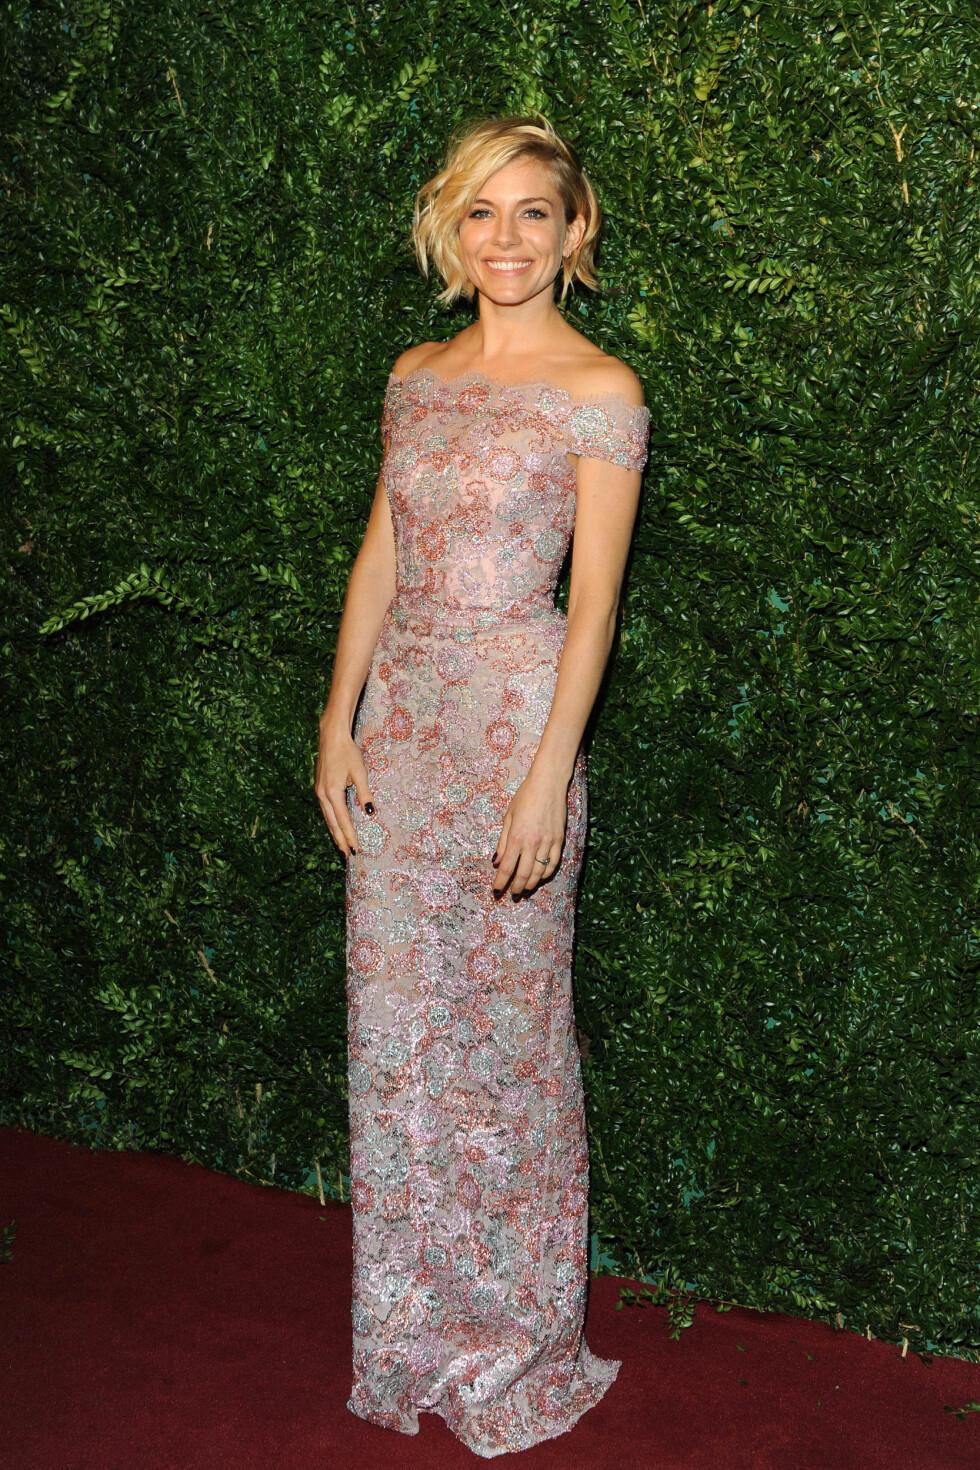 BLOMSTRET: Sienna Miller hadde valgt en fargerik kjole fra klesmerket Burberry. Foto: Stella Pictures